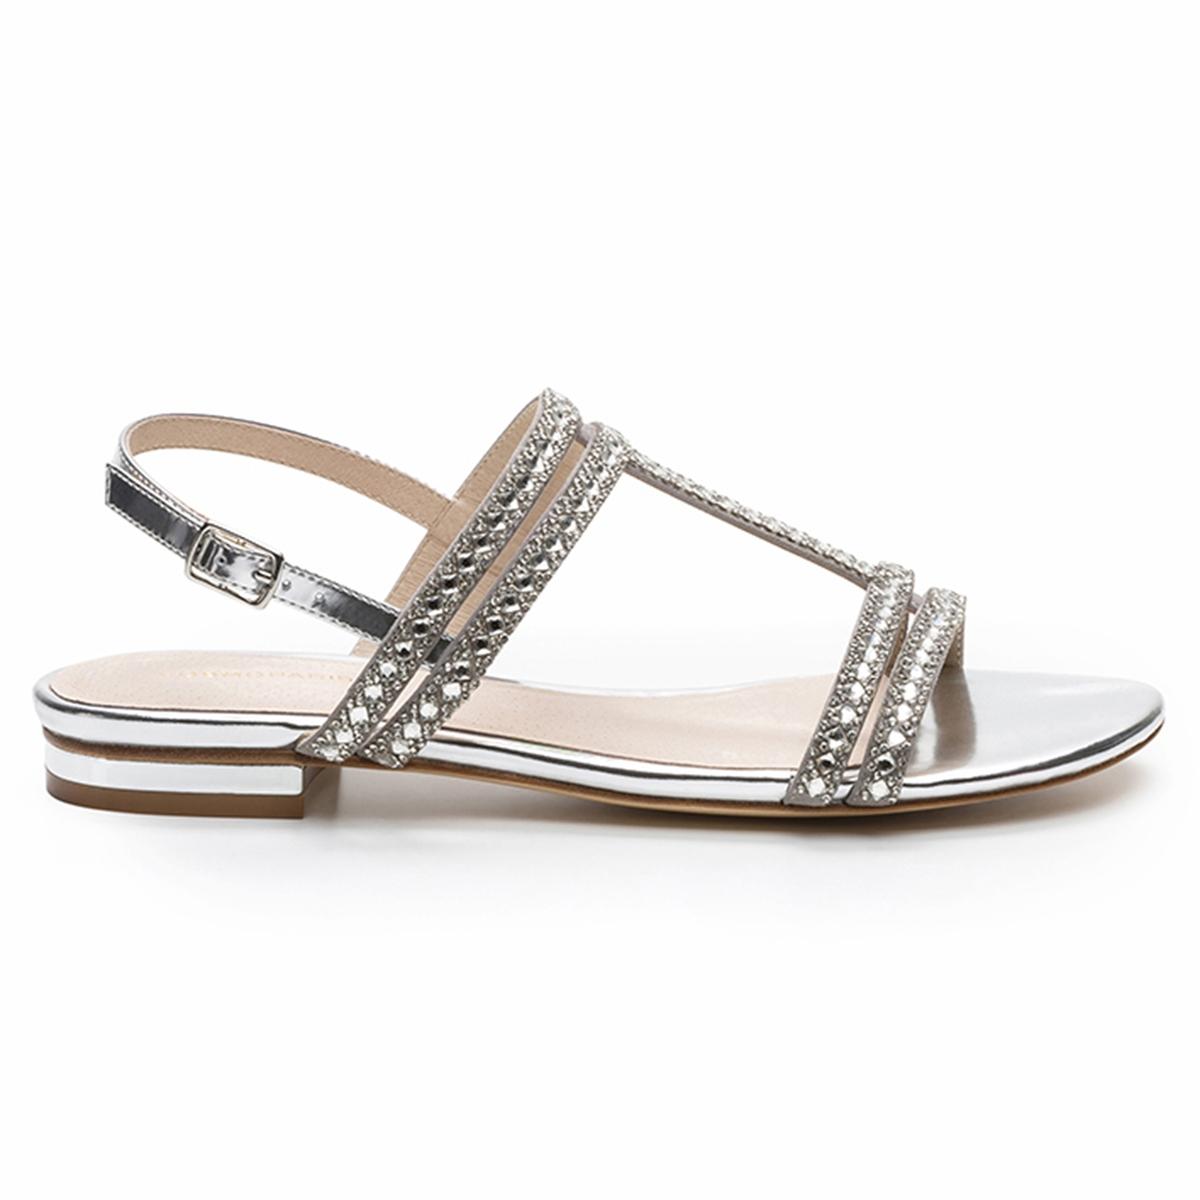 Босоножки кожаные на плоском каблуке, Hidi Mir сапоги кожаные на плоском каблуке 1137